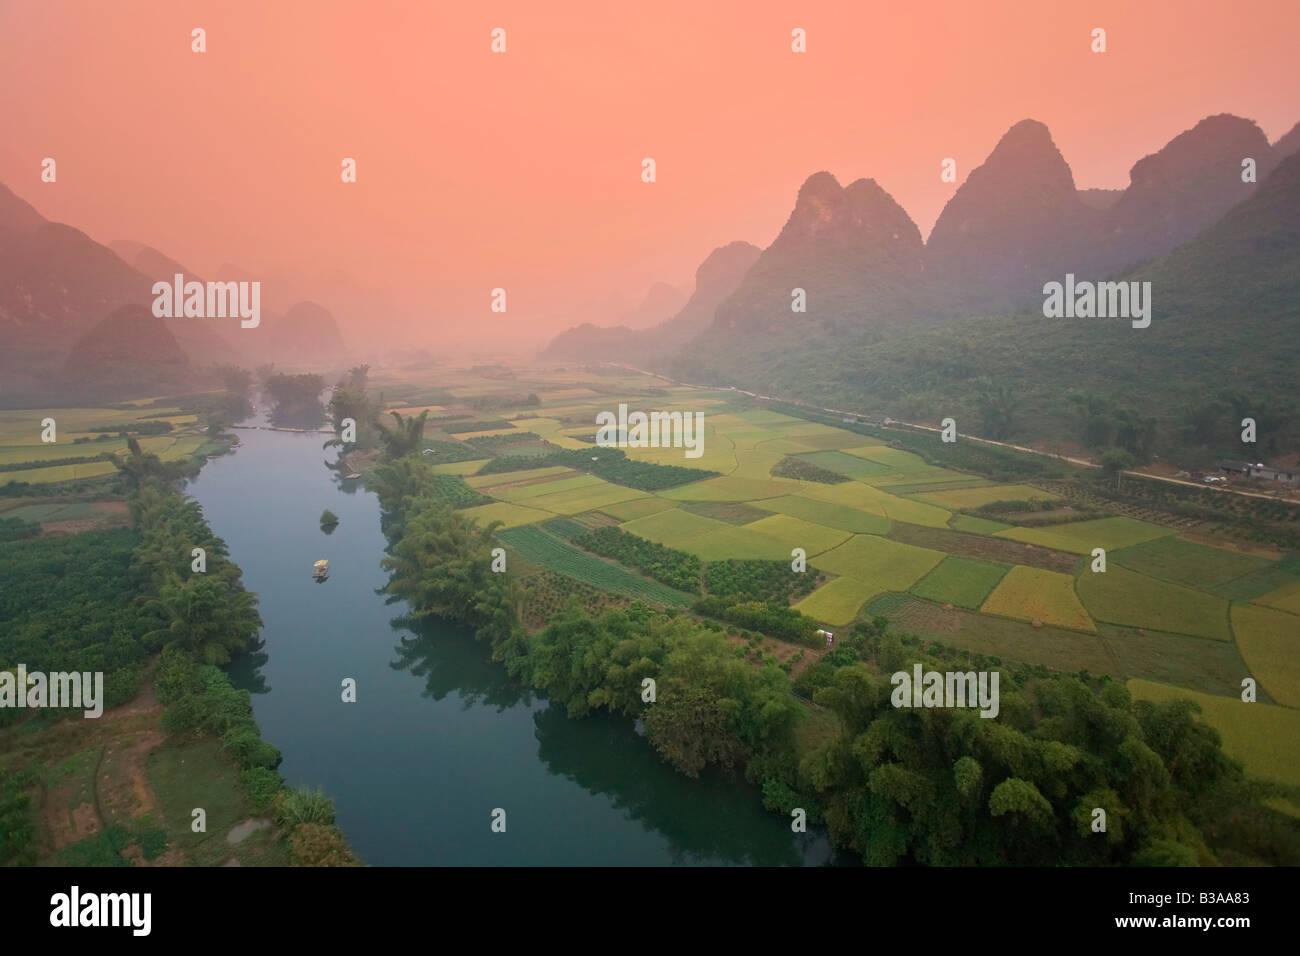 Carso paesaggio di montagna & fiume Li da una mongolfiera, Yangshuo, Guilin, provincia di Guangxi, Cina Immagini Stock